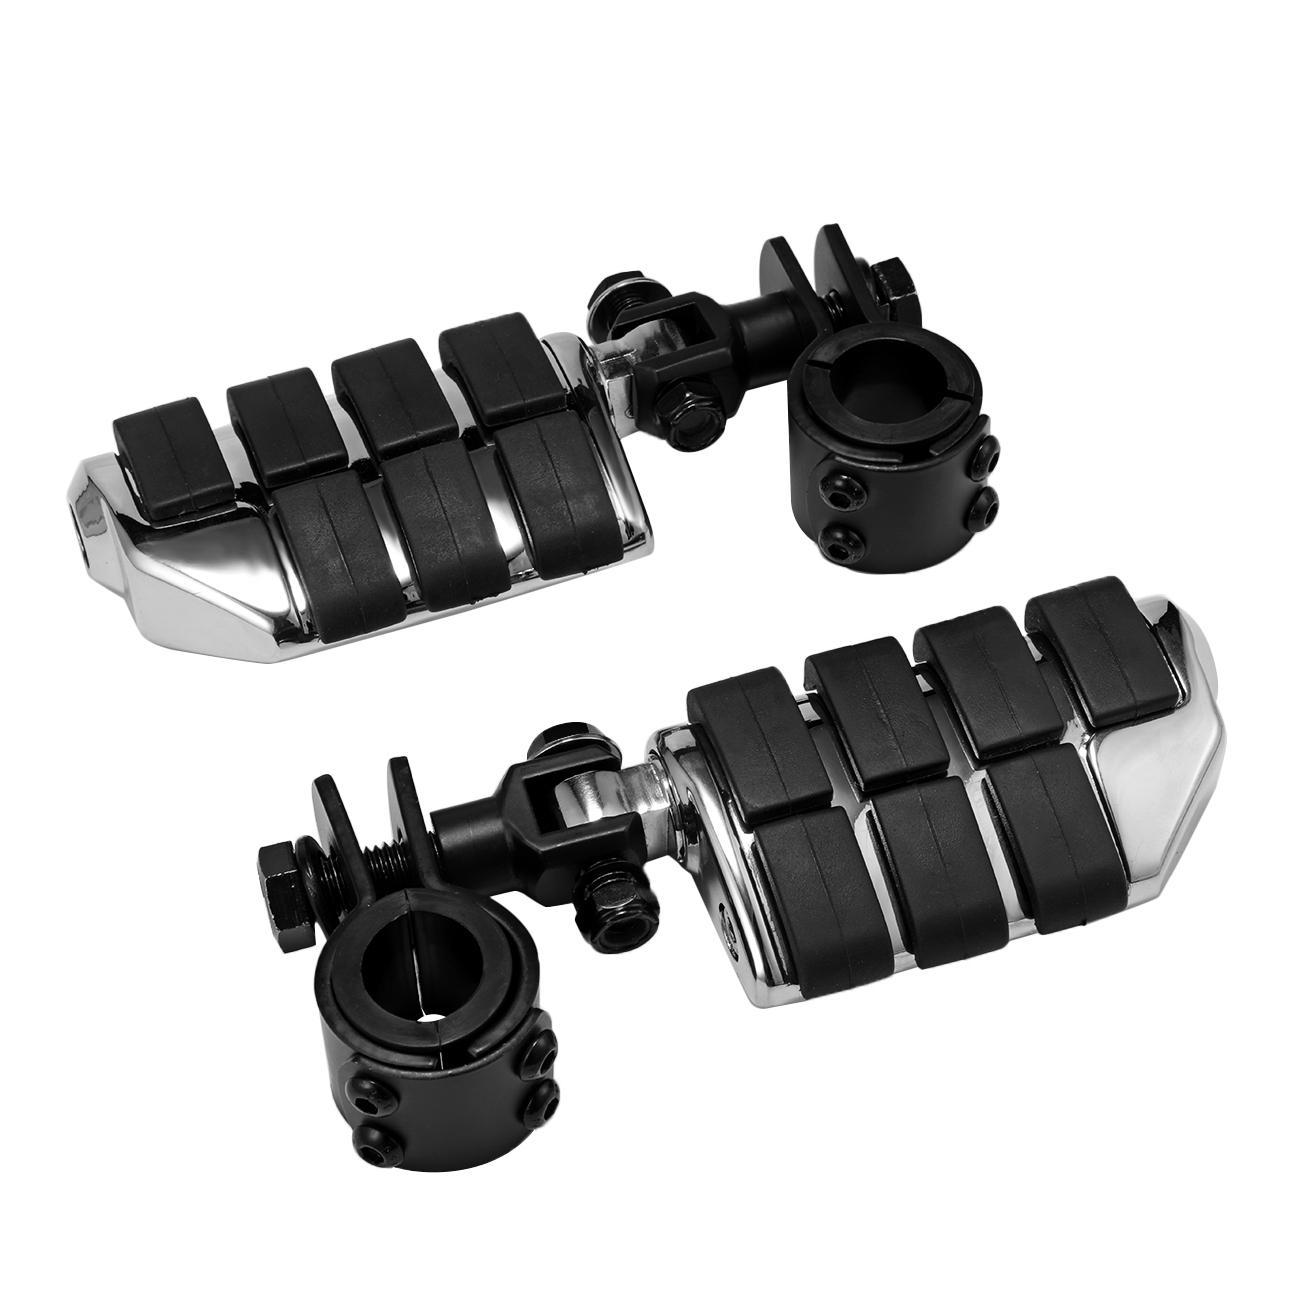 Clamps For Honda VTX 1300 C R S RETRO Chrome AntiVibrate Engine Guard Foot Pegs